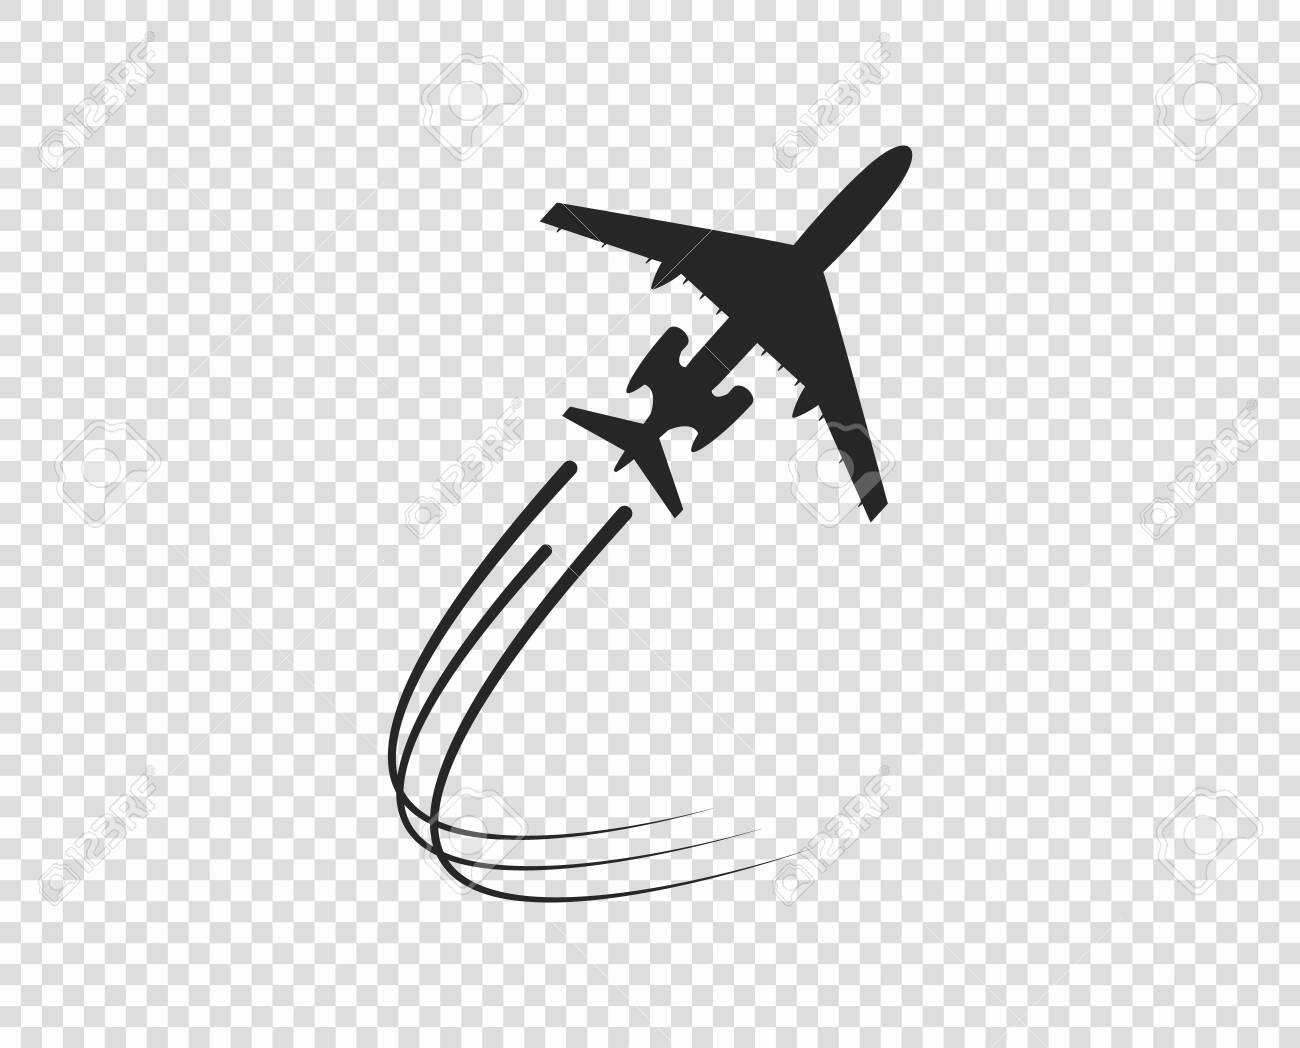 Airplane Icon Silhouette Taking Off A Twisting Plane Trail